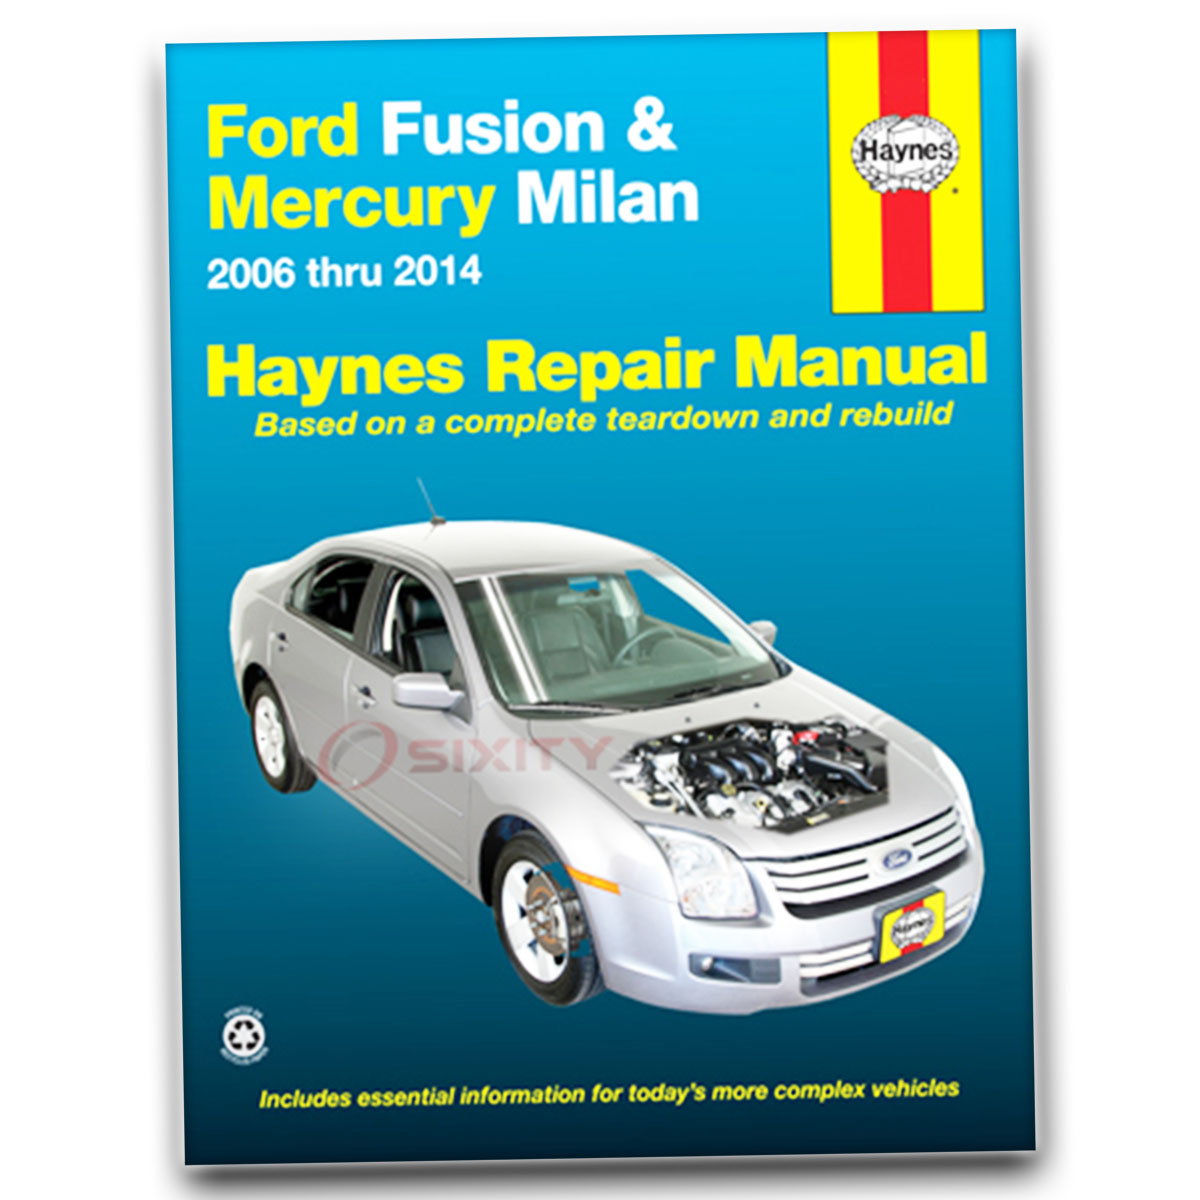 ford fusion haynes repair manual s sport sel hybrid shop service rh ebay com 2010 ford fusion service manual 2010 ford fusion repair manual free